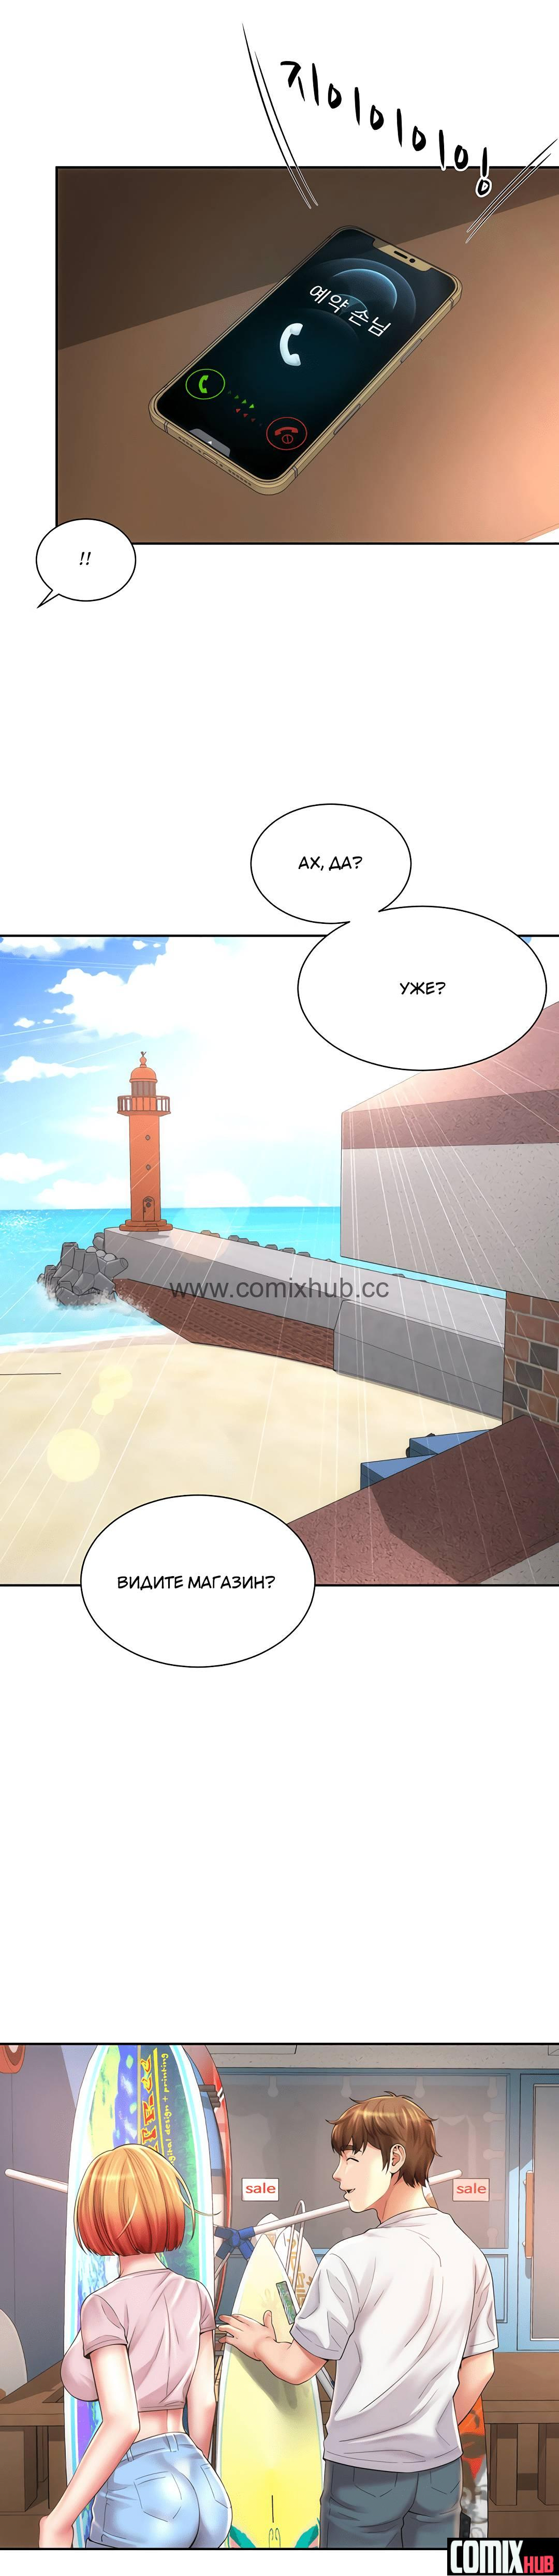 Манхва Богини Пляжа, часть 12 Хентай манга, манхва, Большая грудь, Большая попа, Измена, Мастурбация